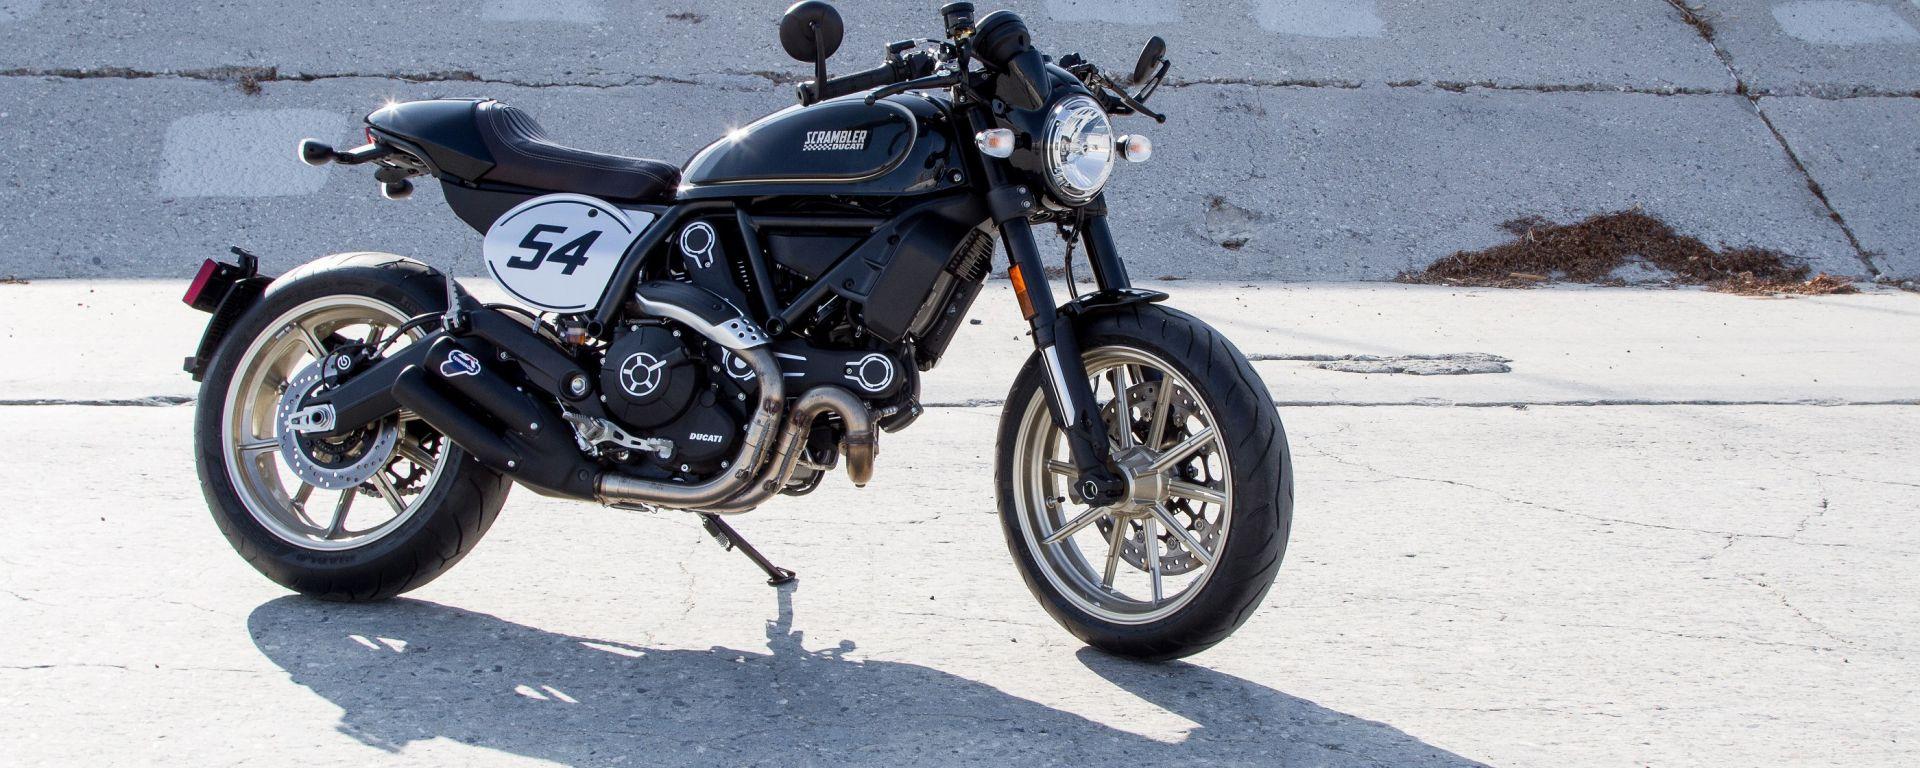 Ducati Scrambler Café Racer nera